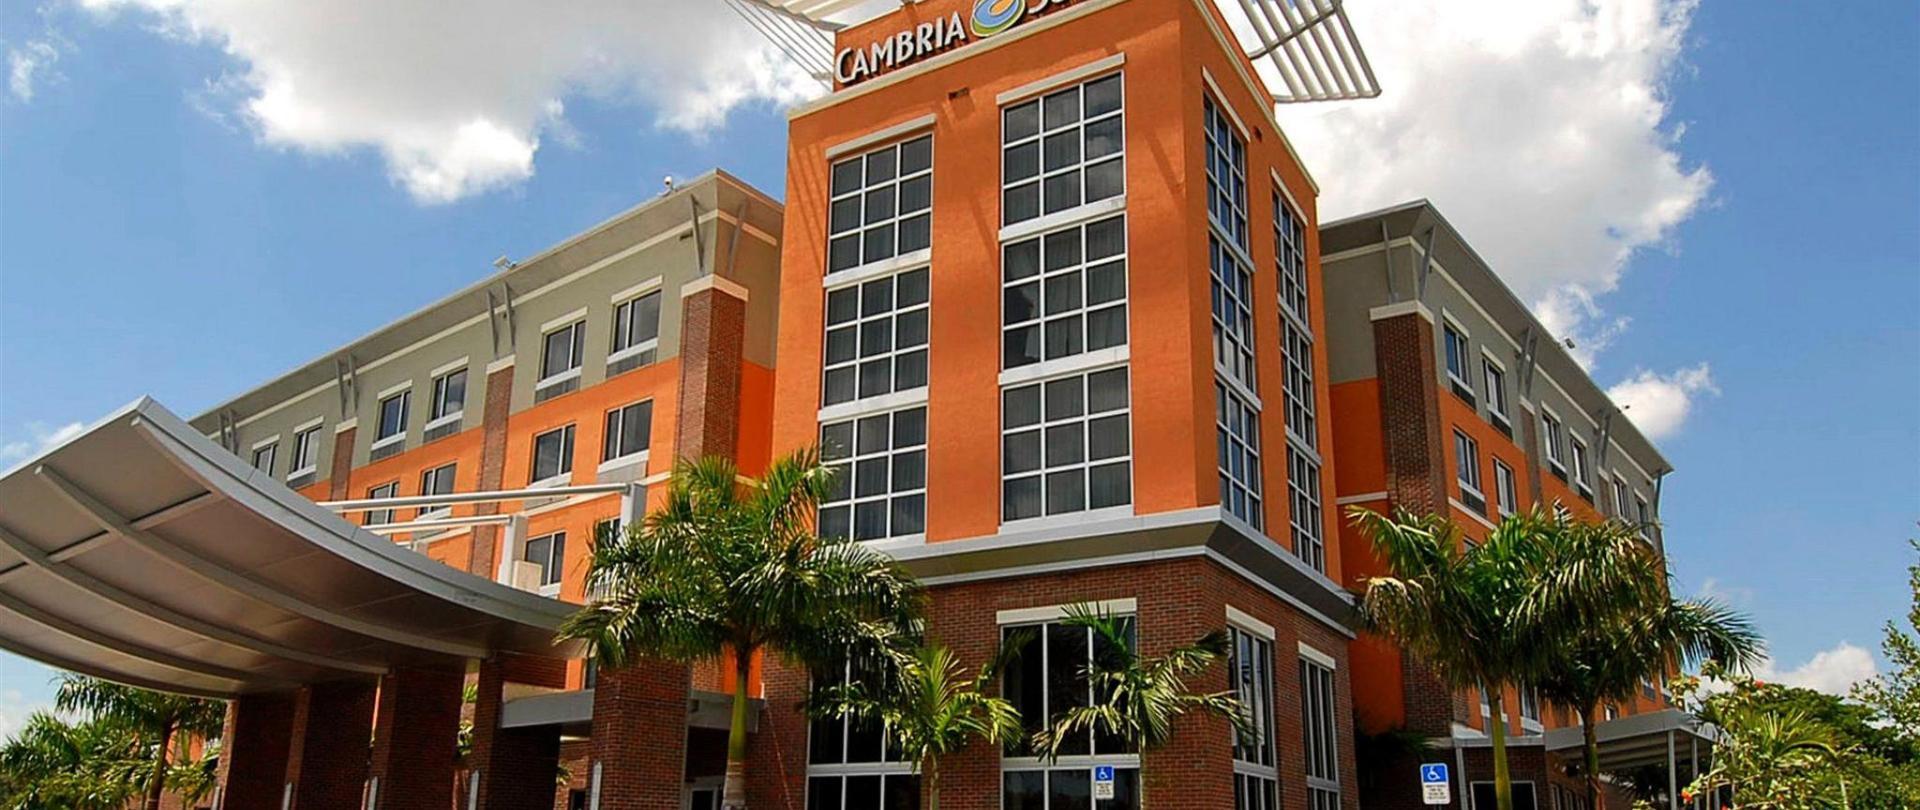 cambria-hotel-suiten-dania-strand-aussen.jpg